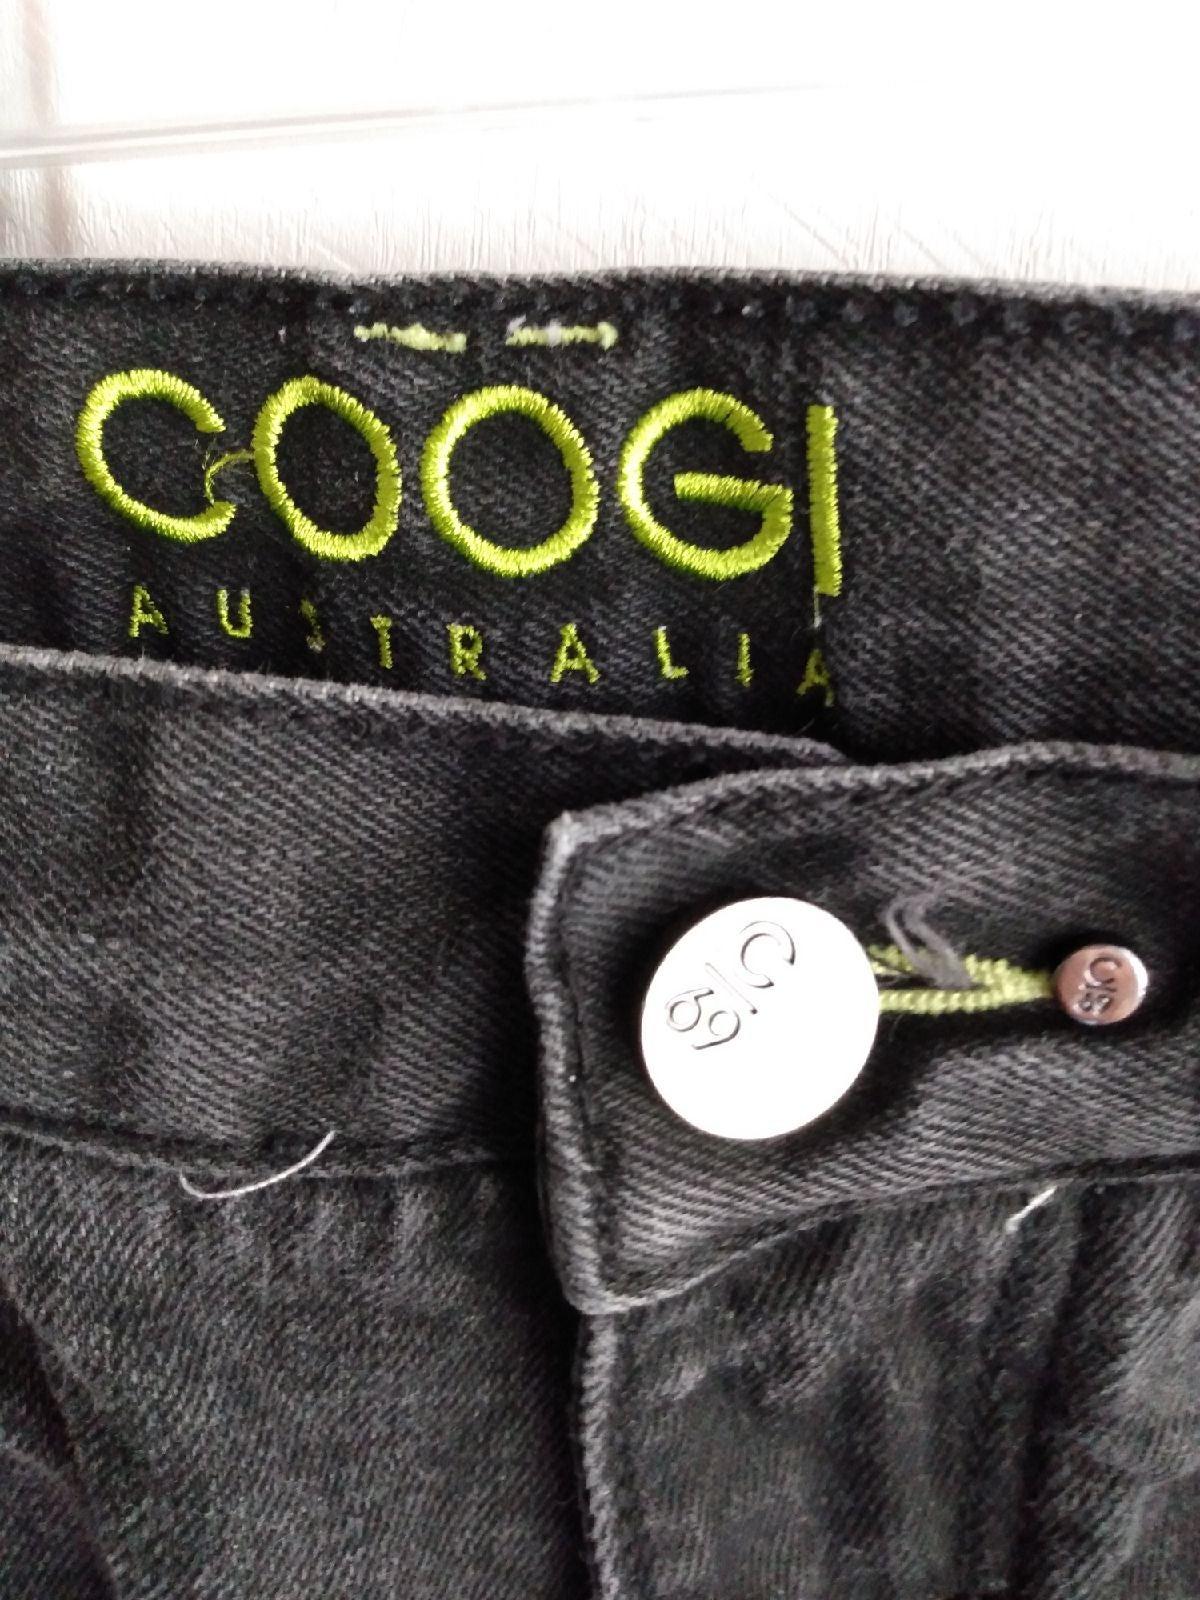 Coogi Men's Jeans 36x32